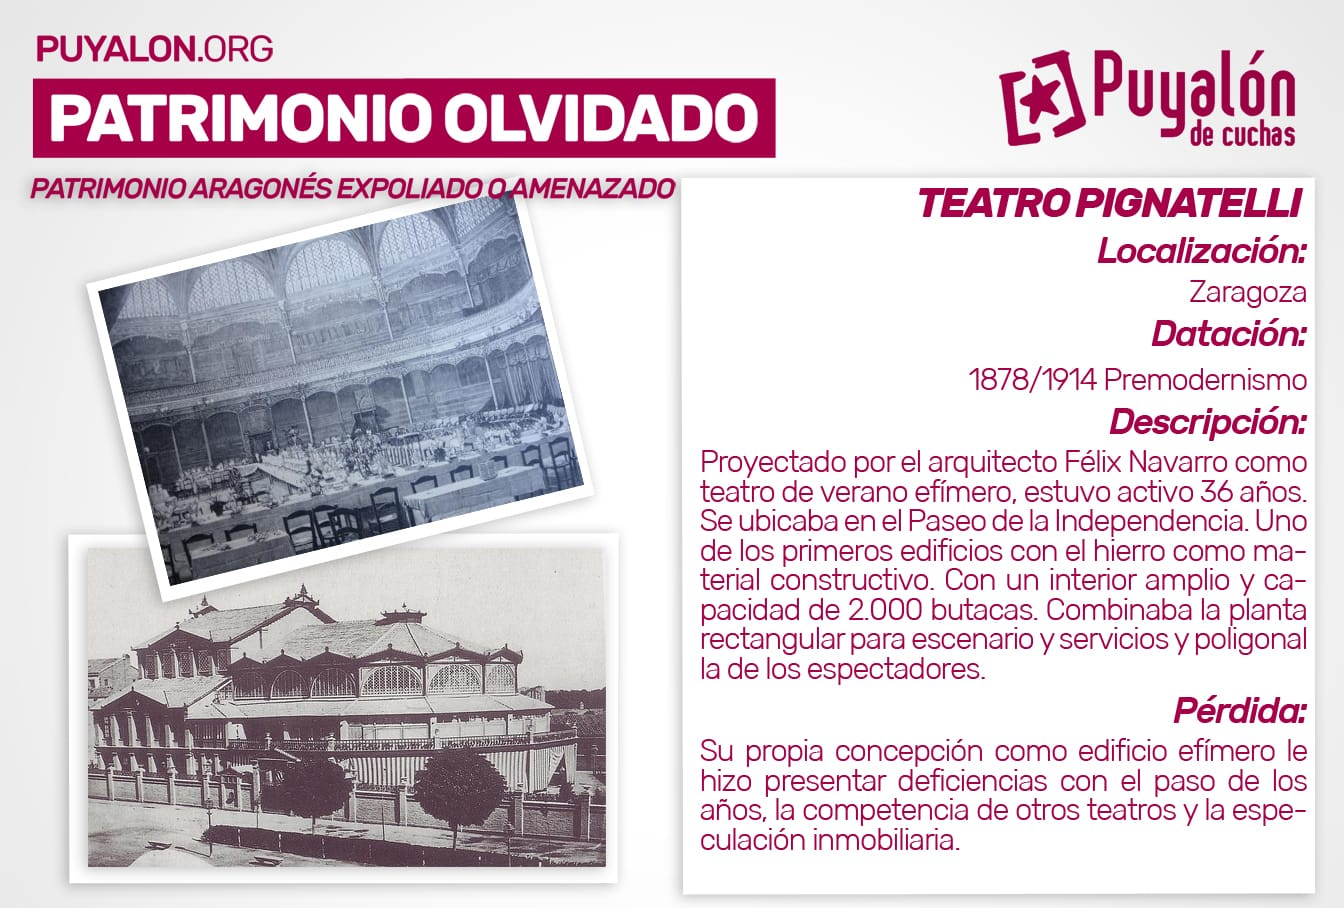 Teatro Pignatelli Zaragoza